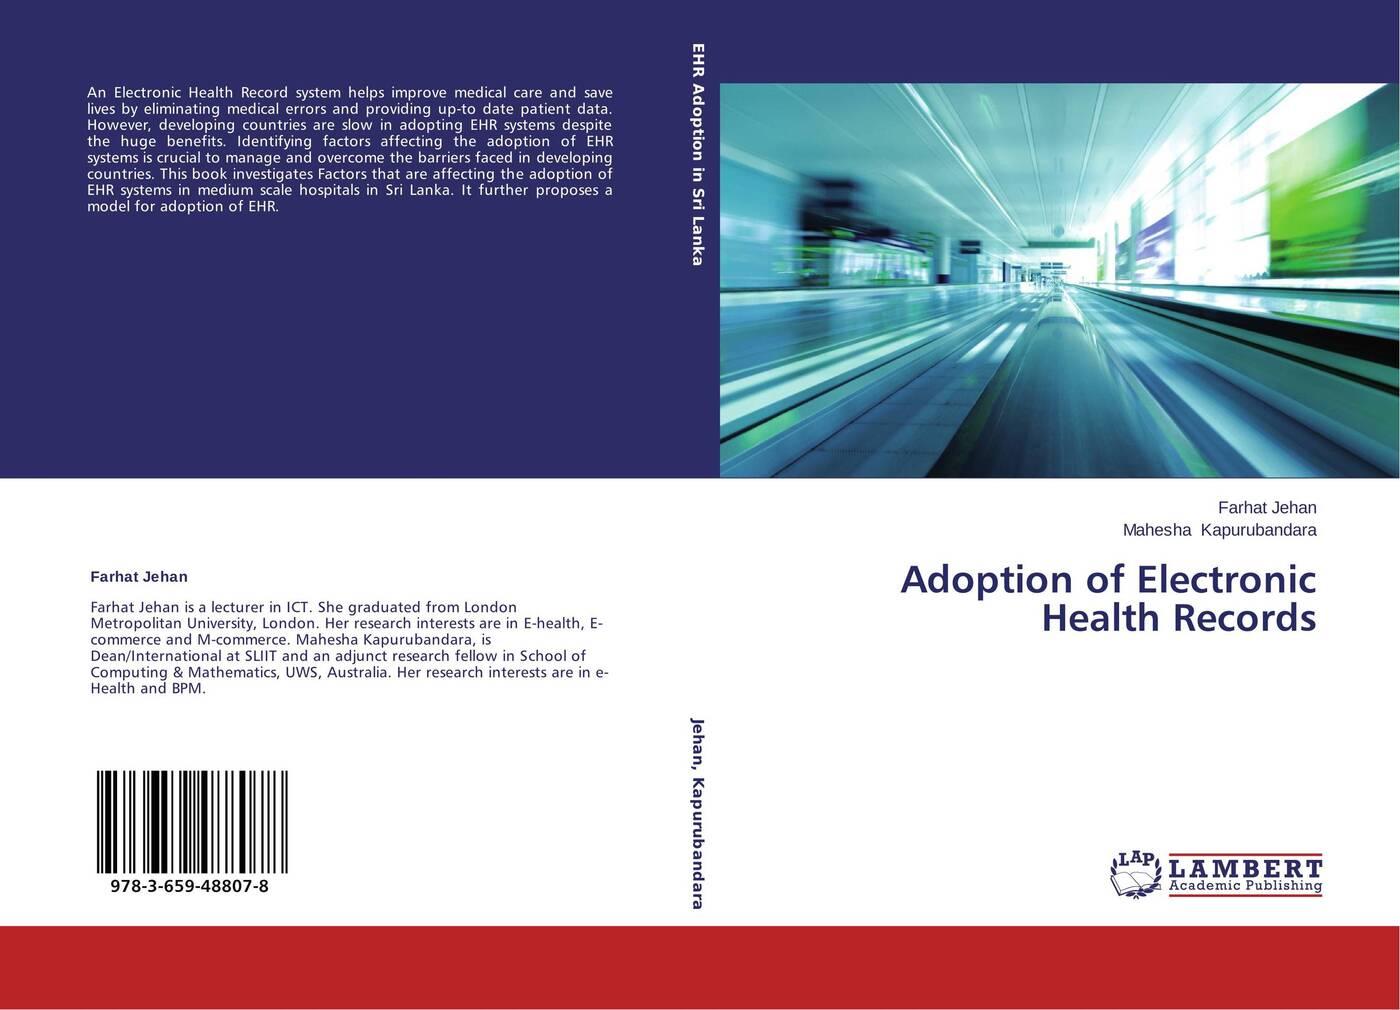 Farhat Jehan and Mahesha Kapurubandara Adoption of Electronic Health Records electronic health records and medical big data